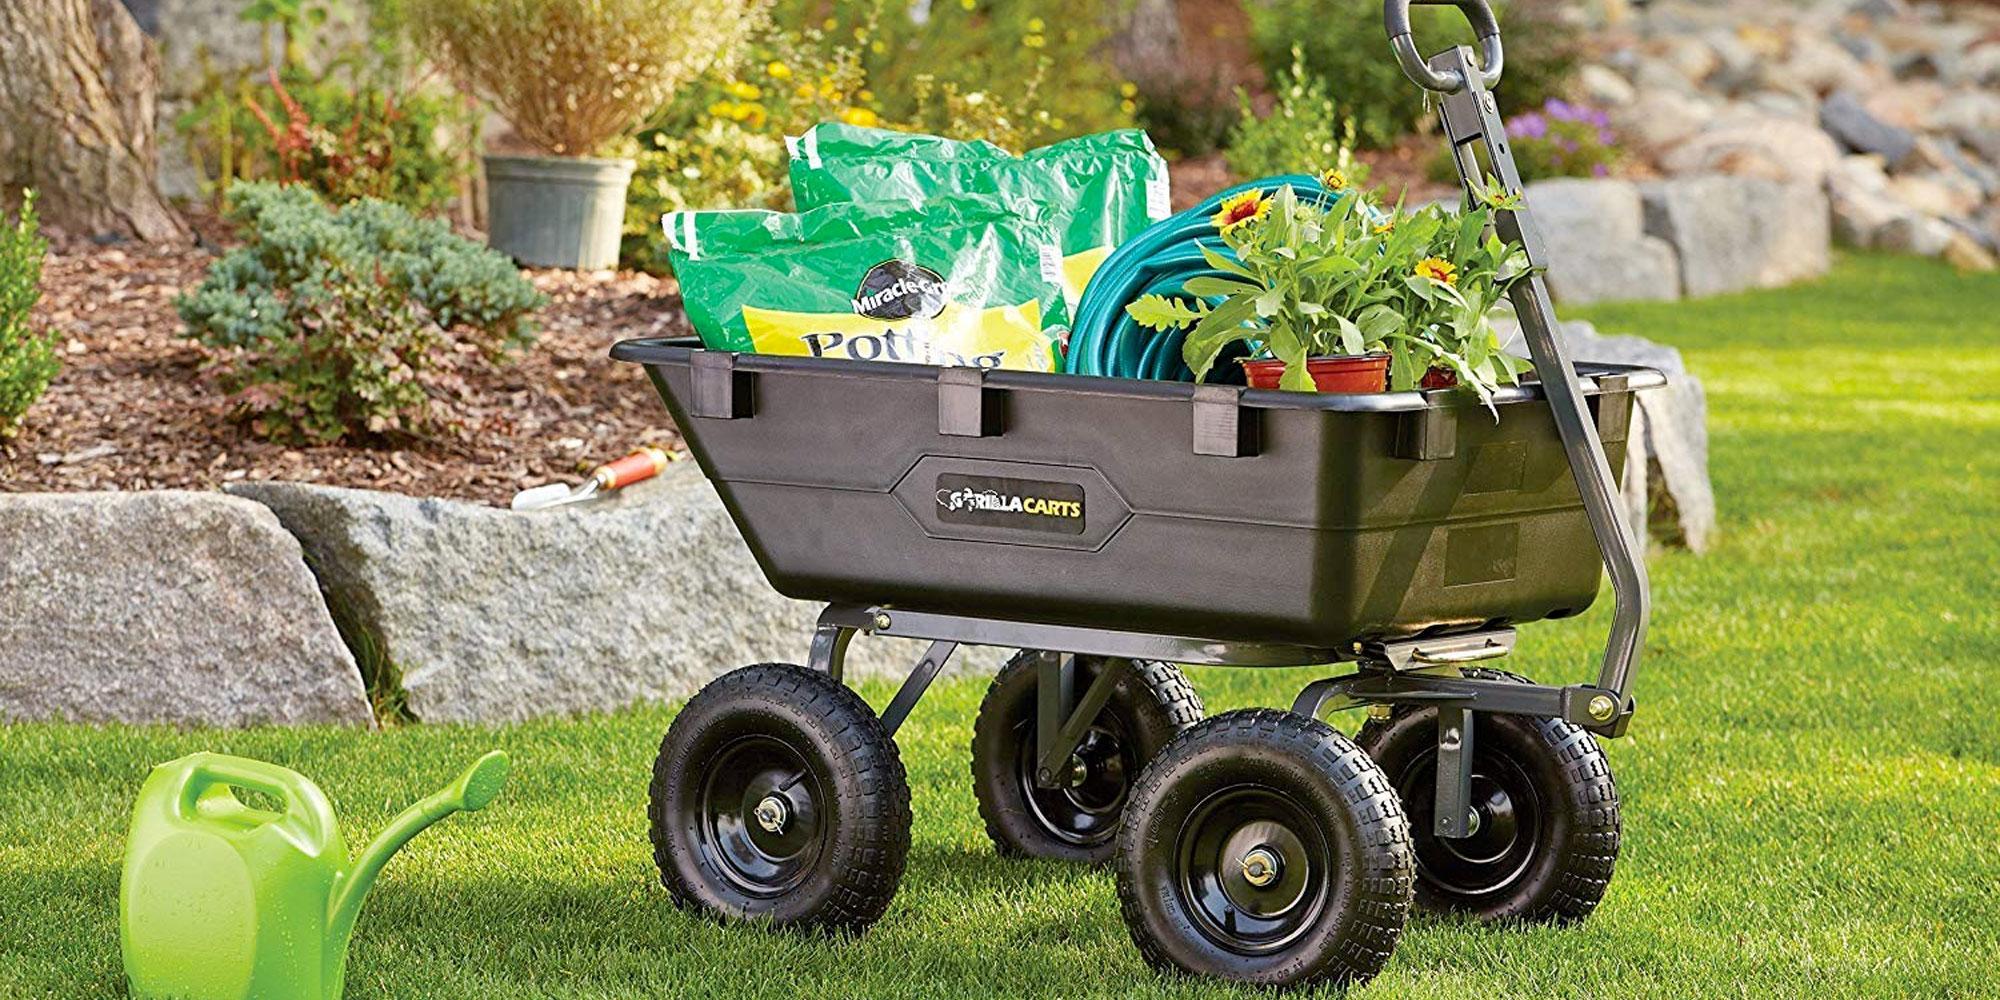 Gorilla Carts 1,200 lb Steel Dump Cart Wagon Garden Yard Heavy Duty Lawn NEW